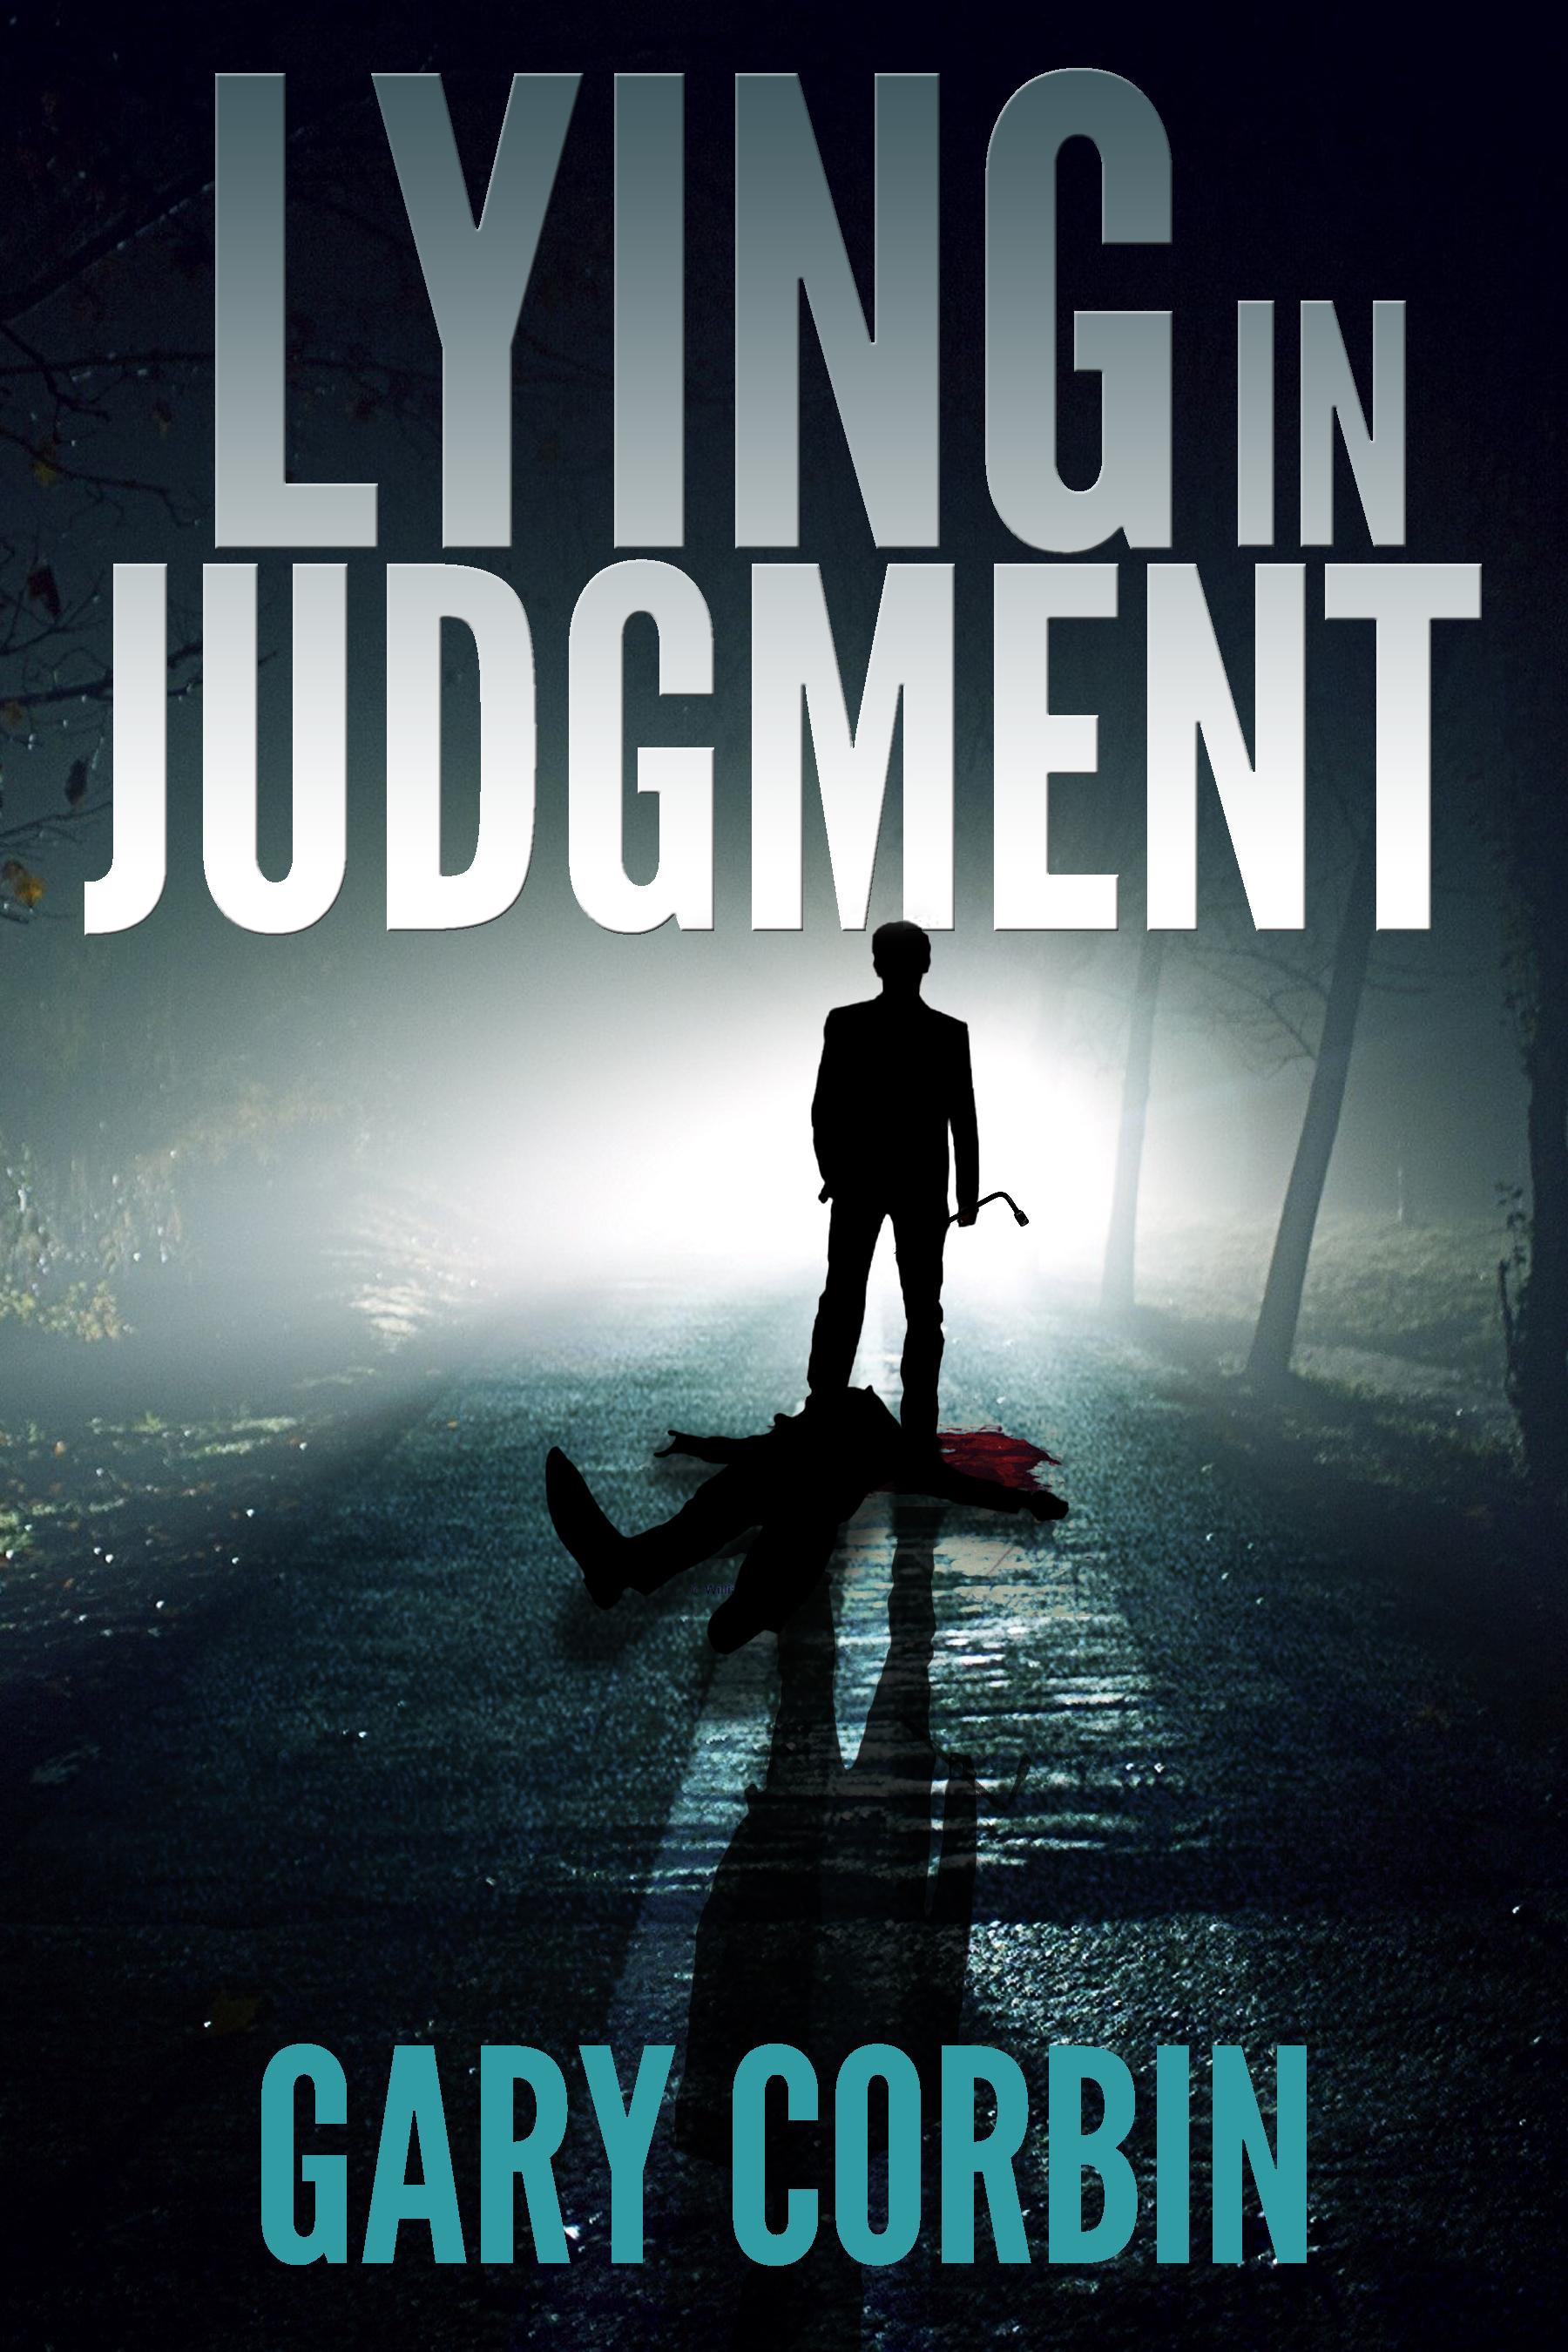 Lying in Judgment by Gary Corbin